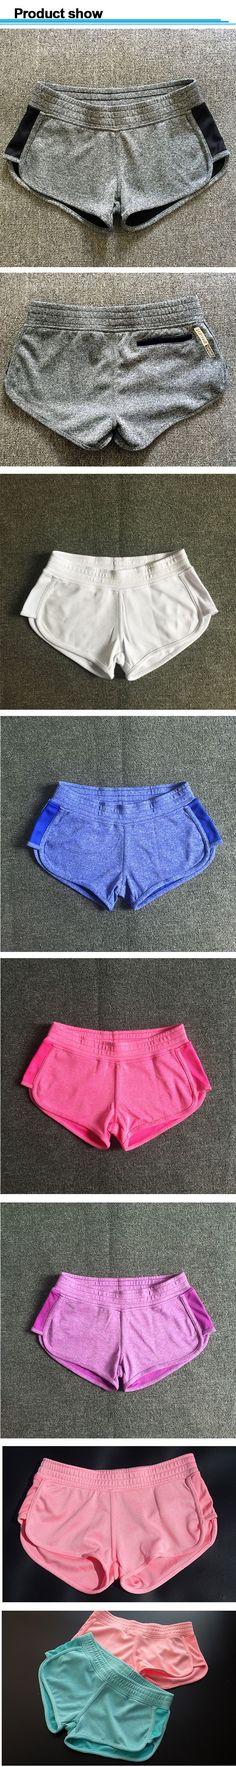 Aliexpress.com  Comprar Mujeres pantalones cortos para correr gimnasio  deporte ocio cintura elástica mujeres Shorts mujer ocasional Yo Ga corto  Feminino de ... fb59dabcc0fc